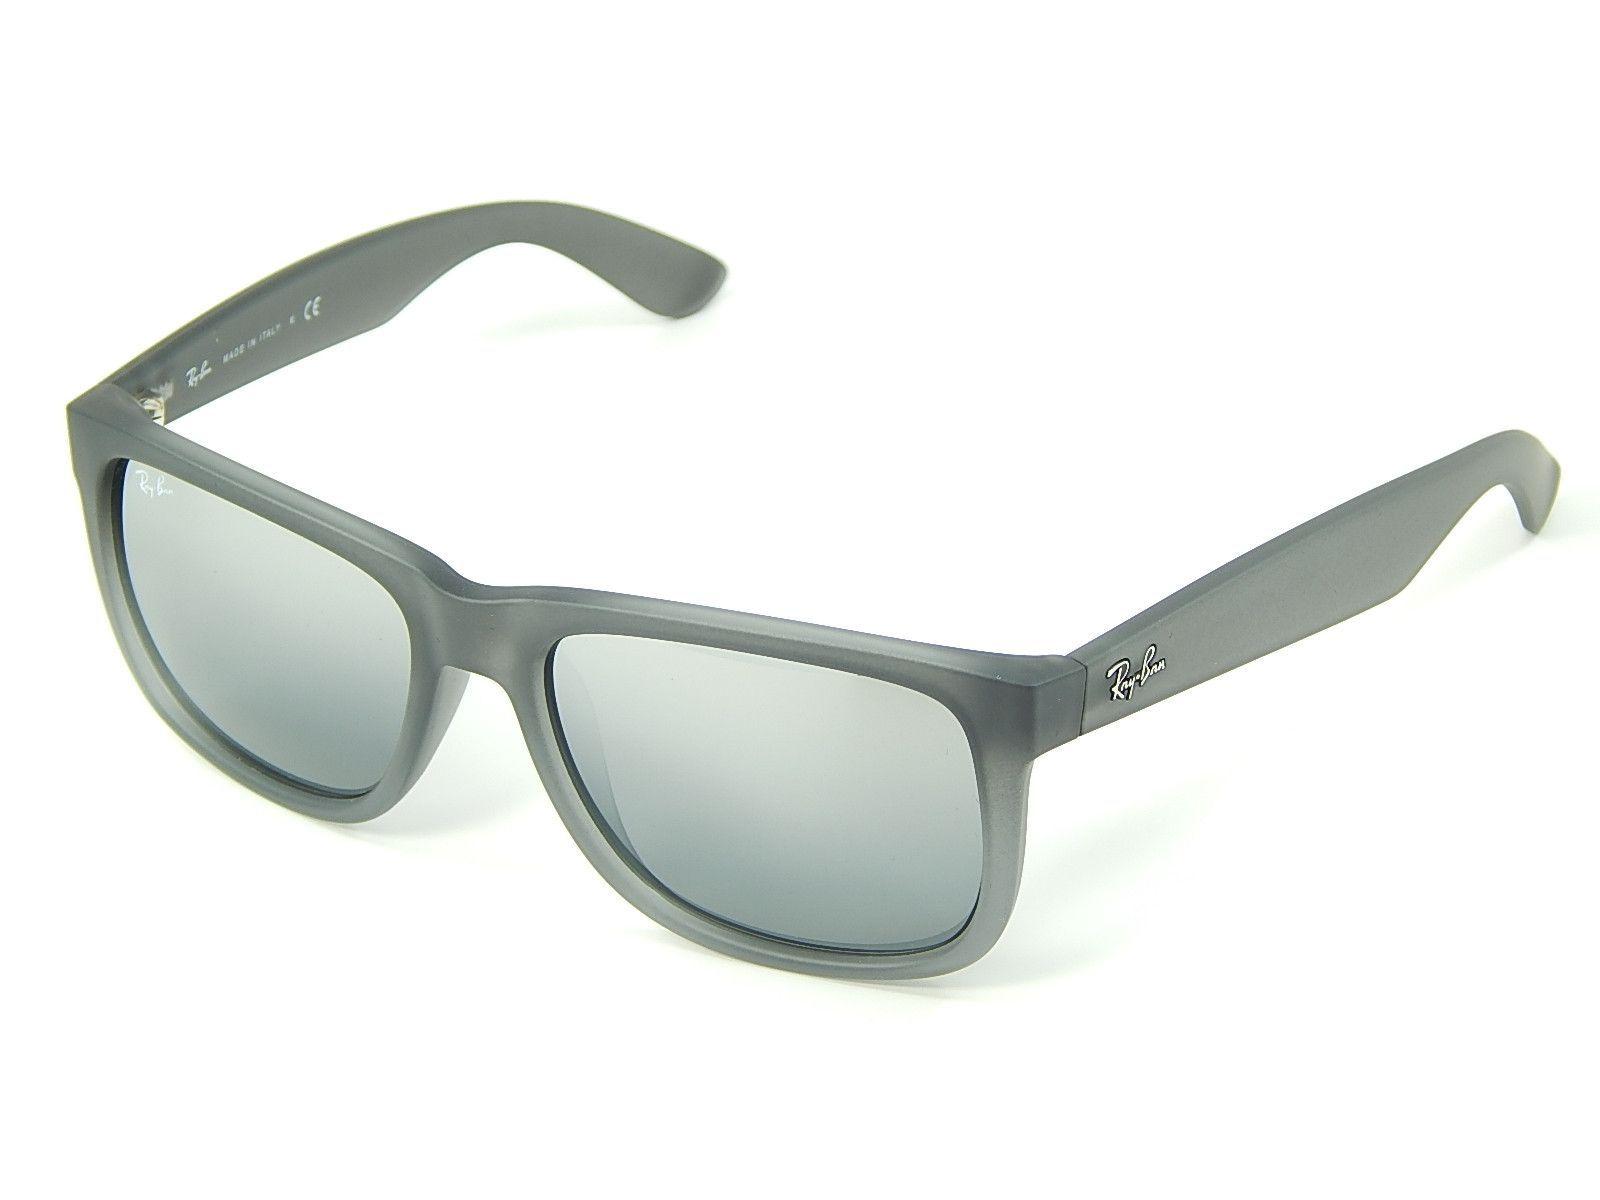 e832f2b161 Ray Ban Justin RB4165 852 88 Grey  Silver Gradient Mirror 51mm Sunglasses